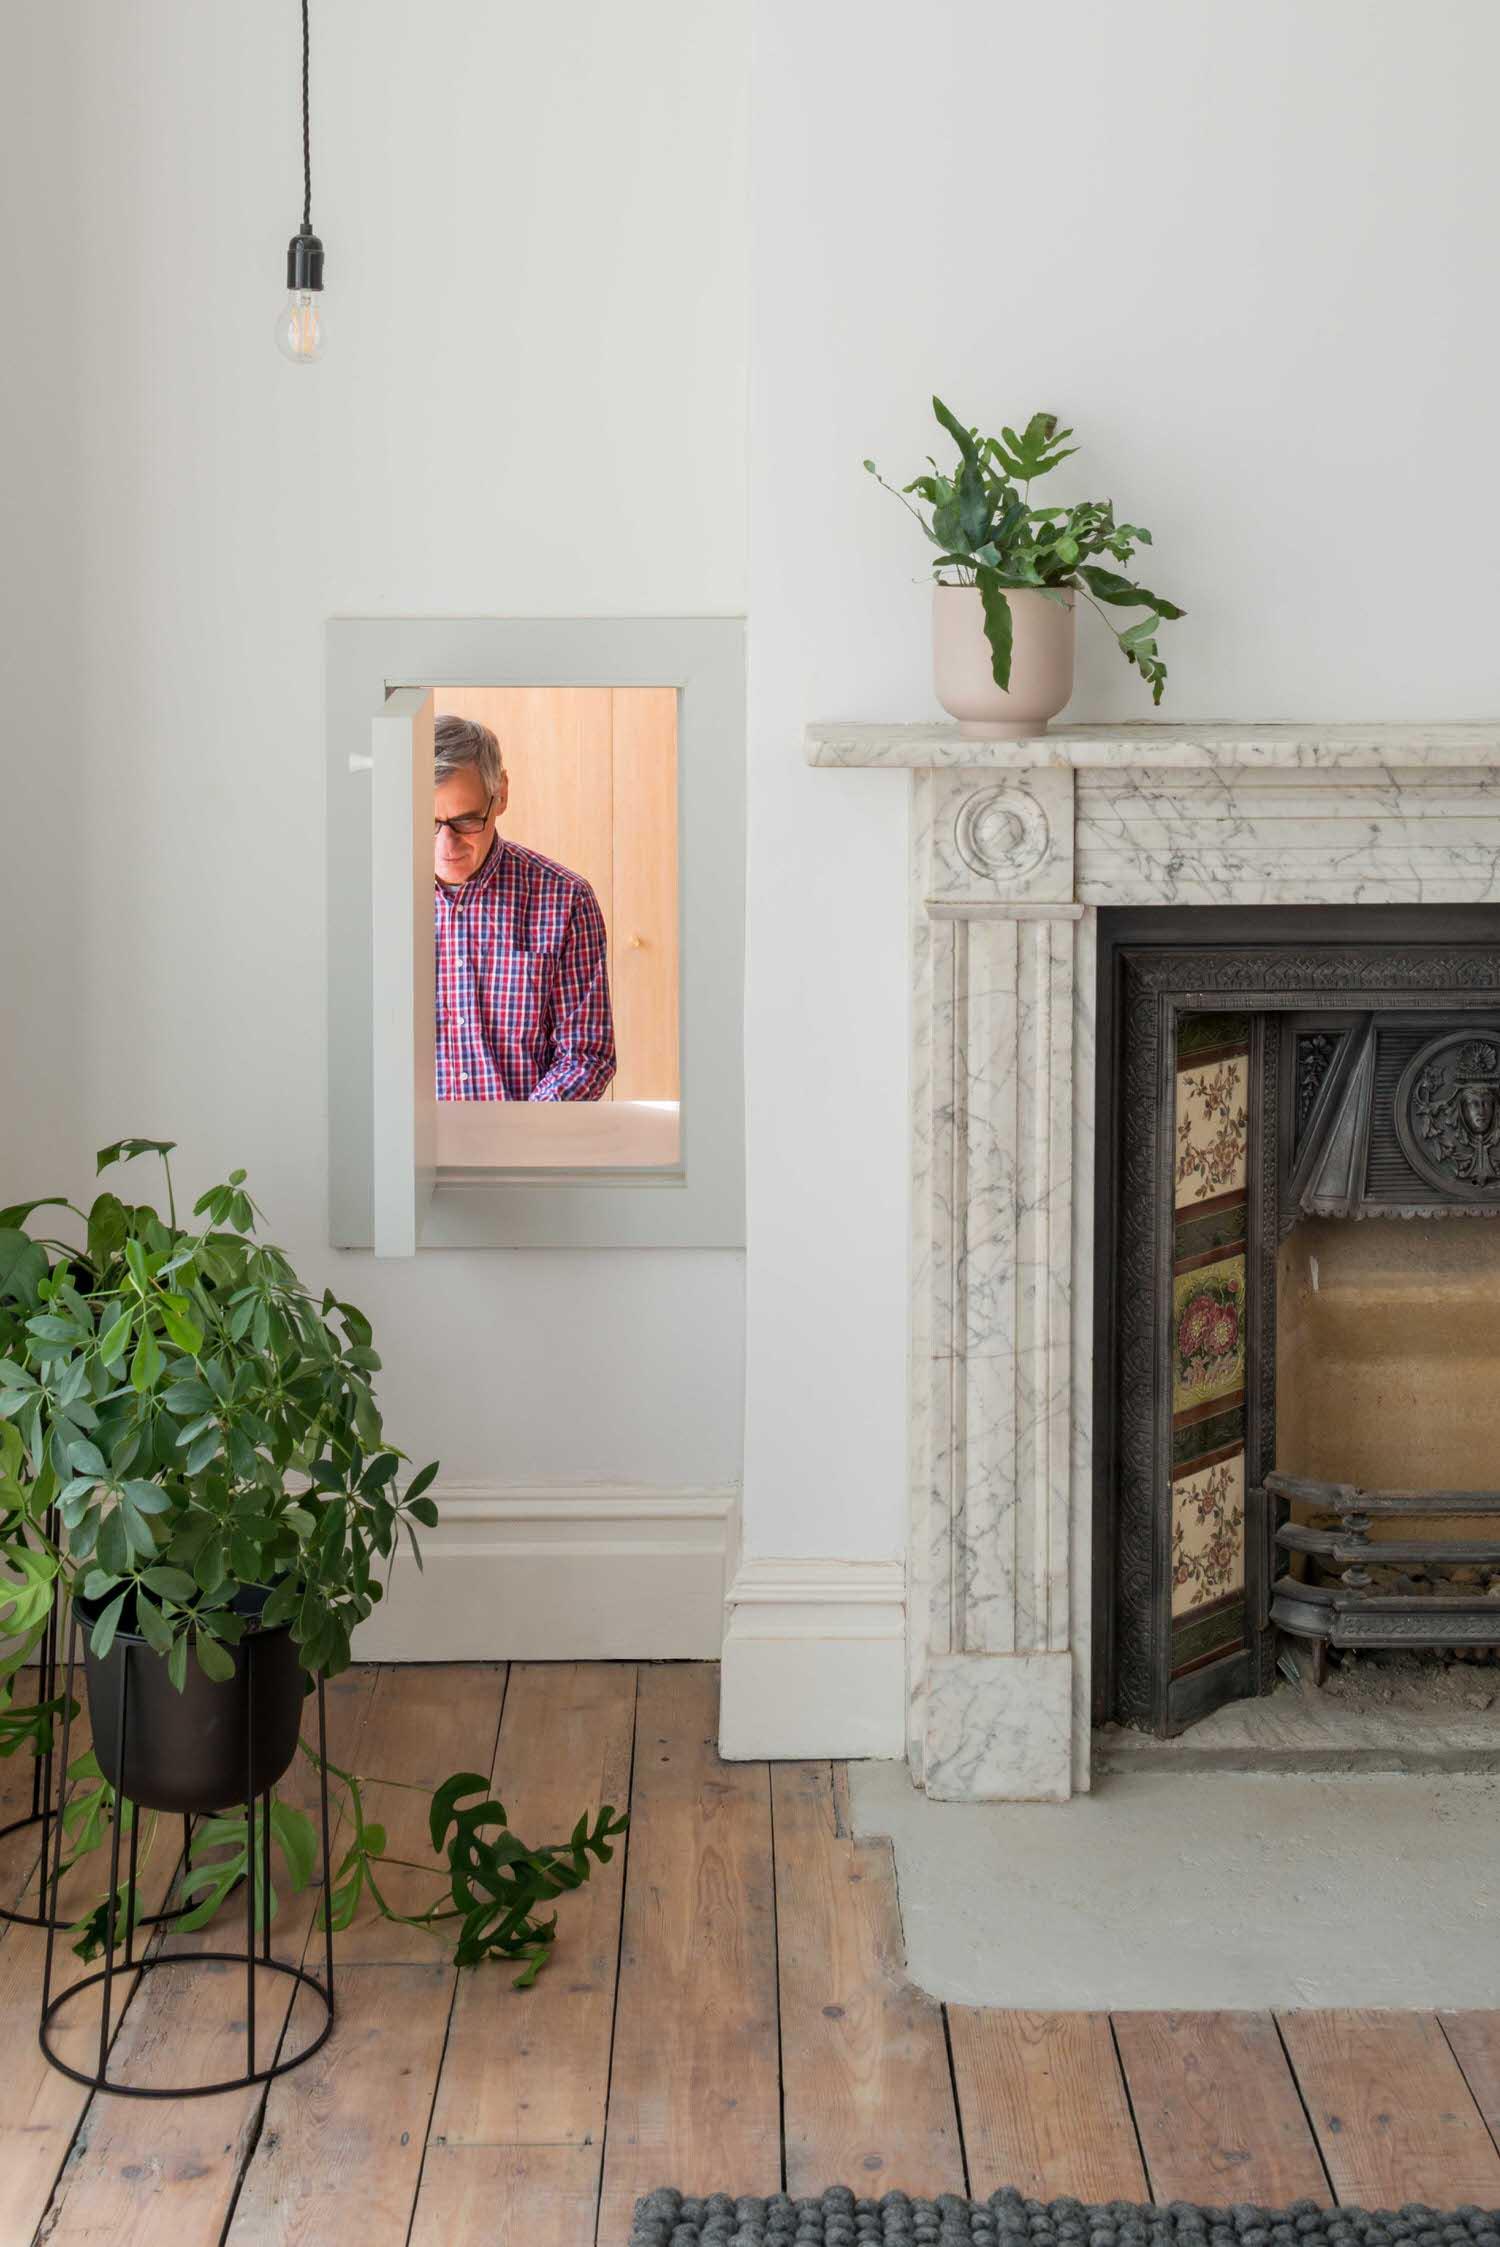 Studio Ben Allen House Recast London Residential Architecture Photo French+tye Yellowtrace 23